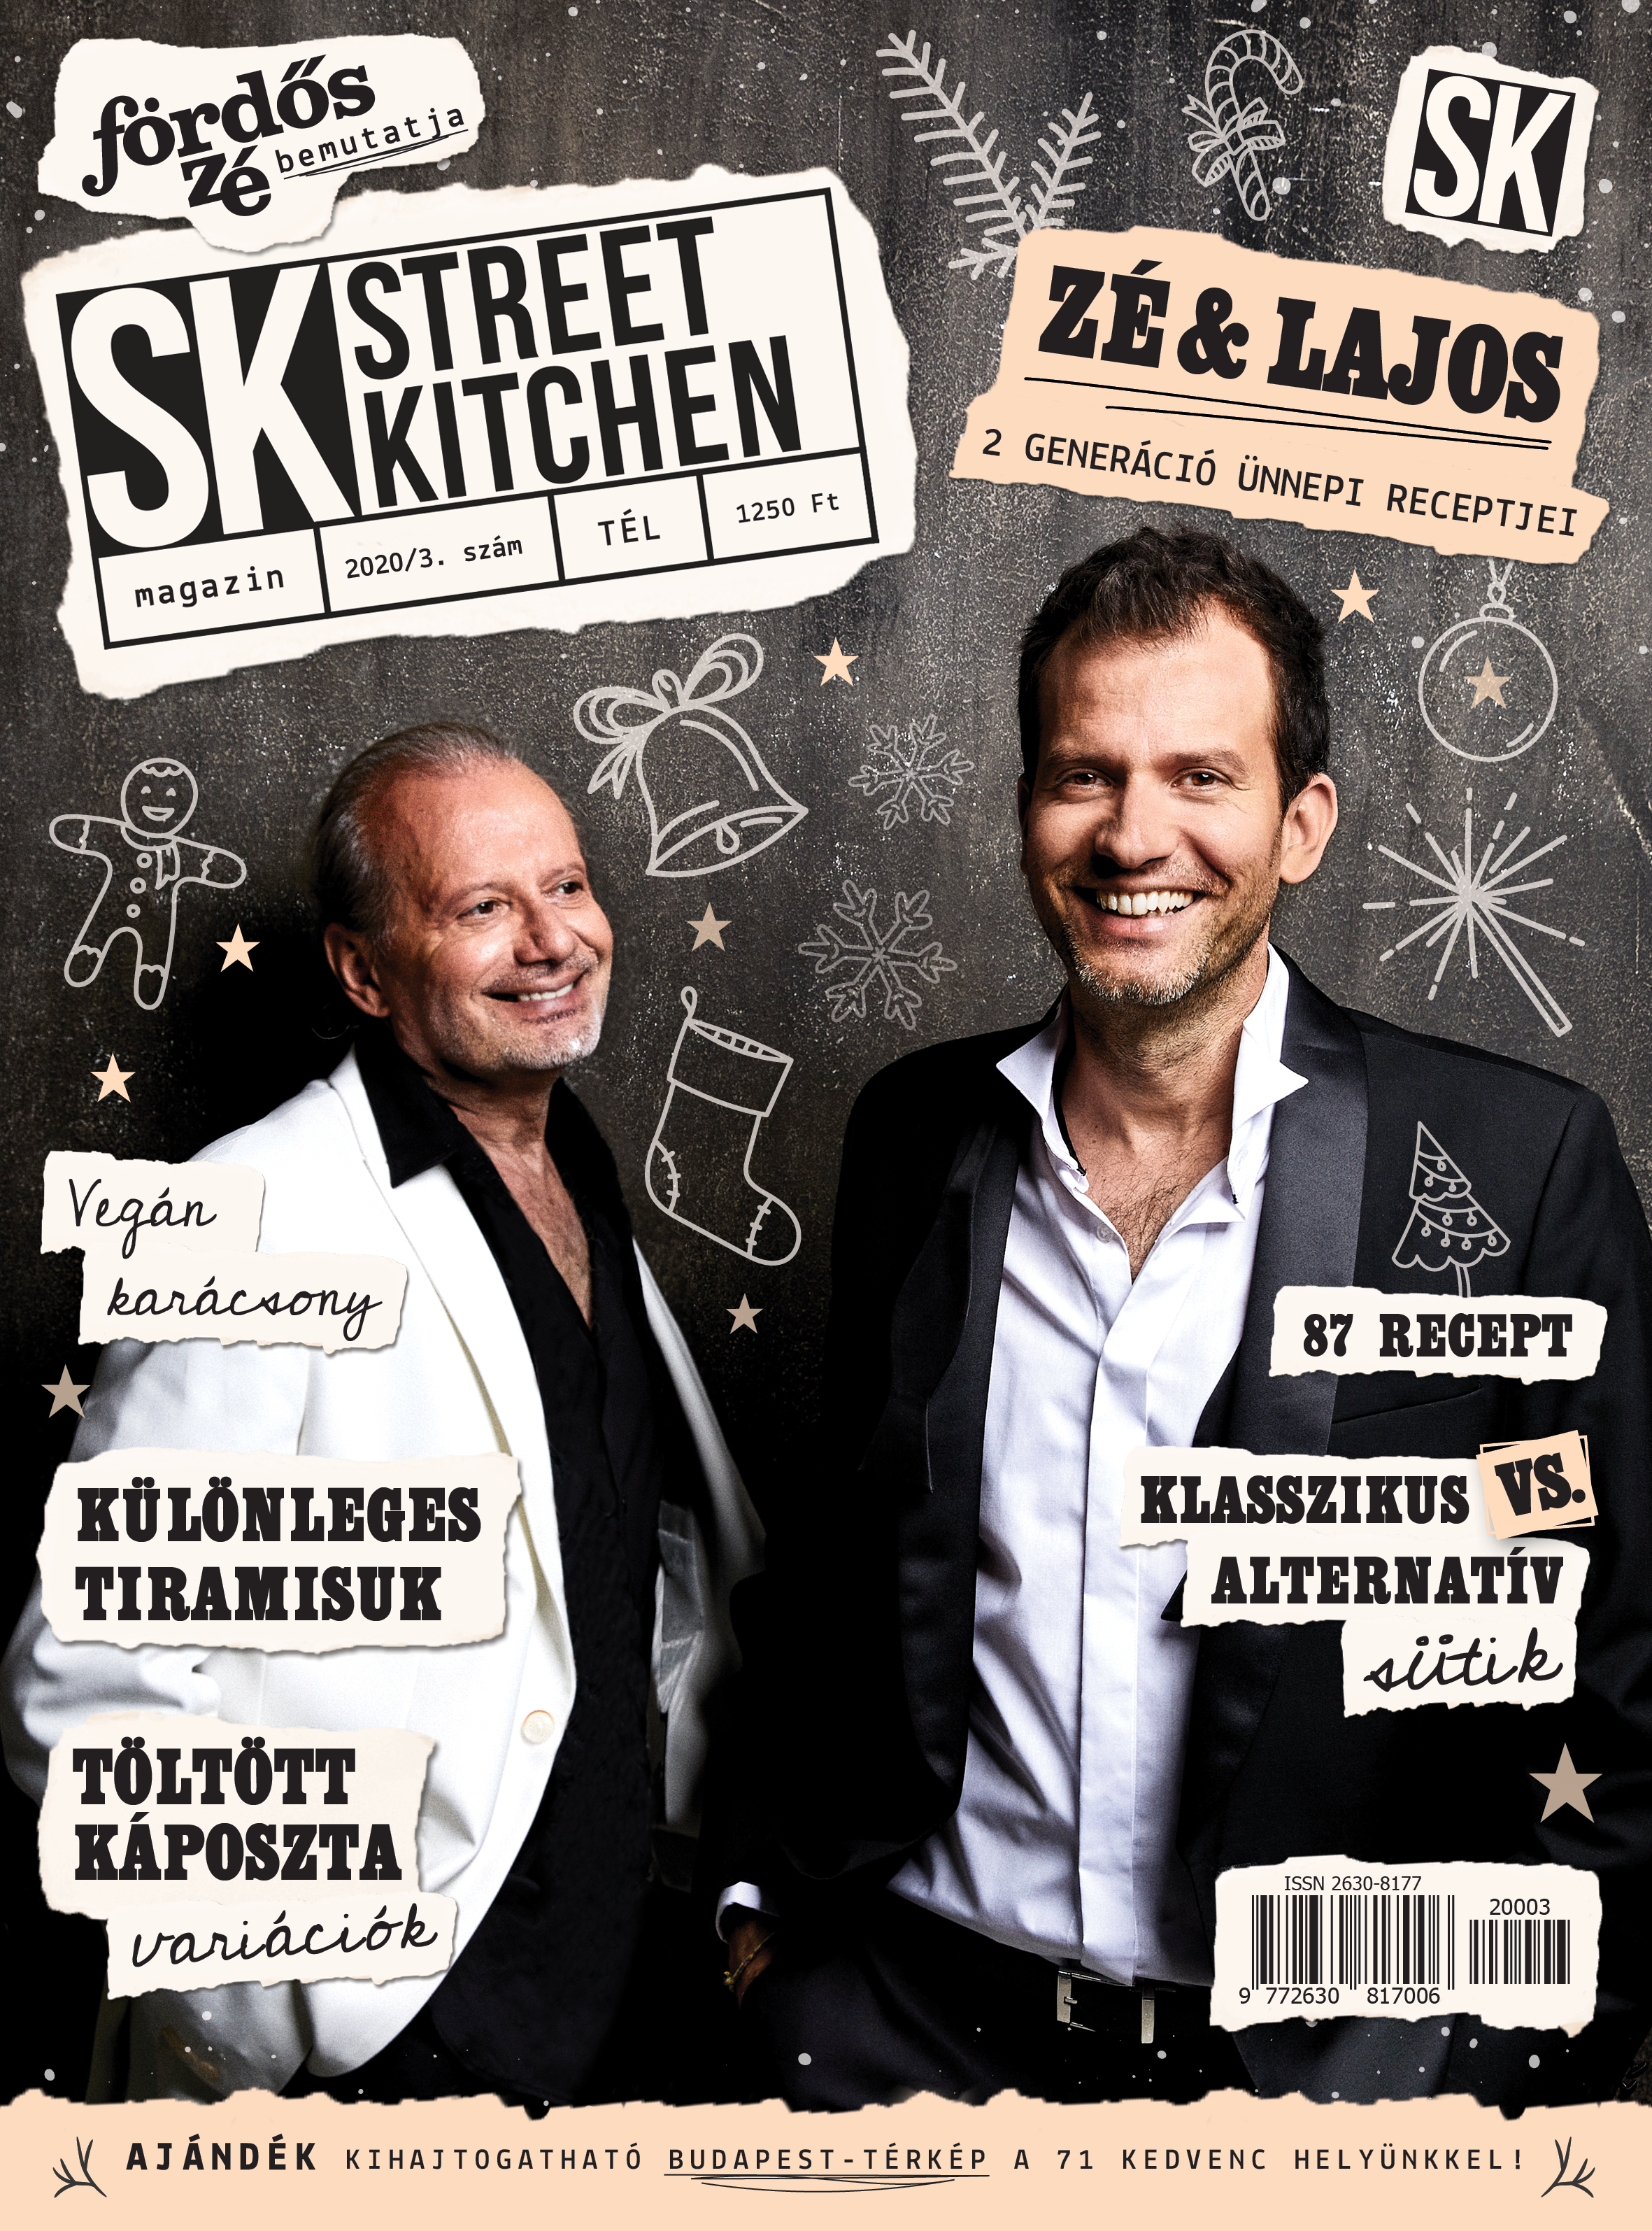 Street Kitchen magazin TÉL 2020/3